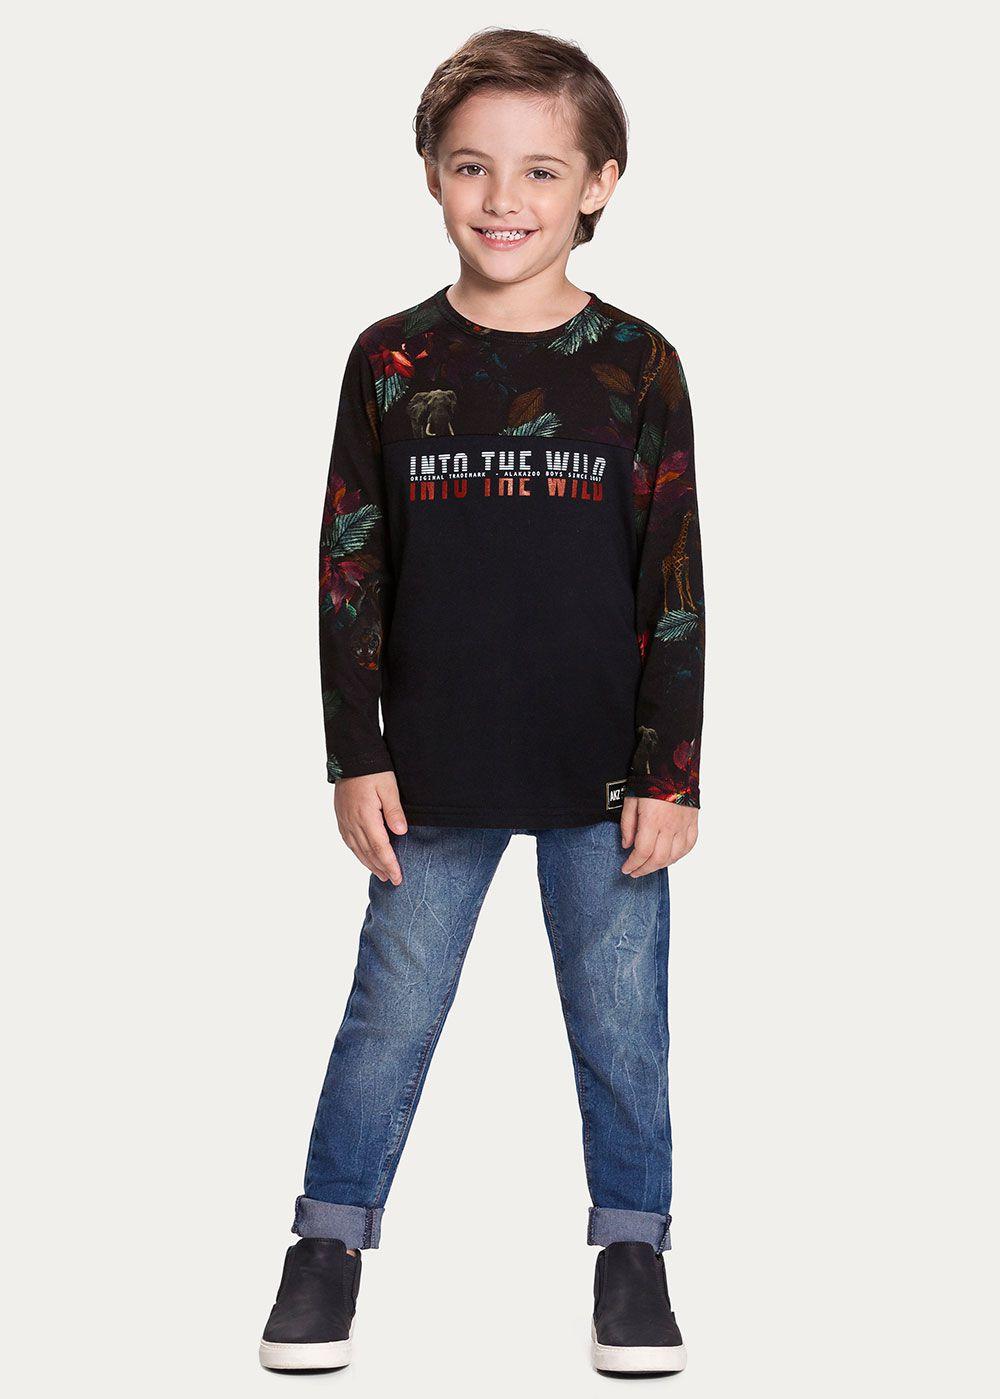 Camiseta Infantil Masculina Inverno Preta Wild Alakazoo